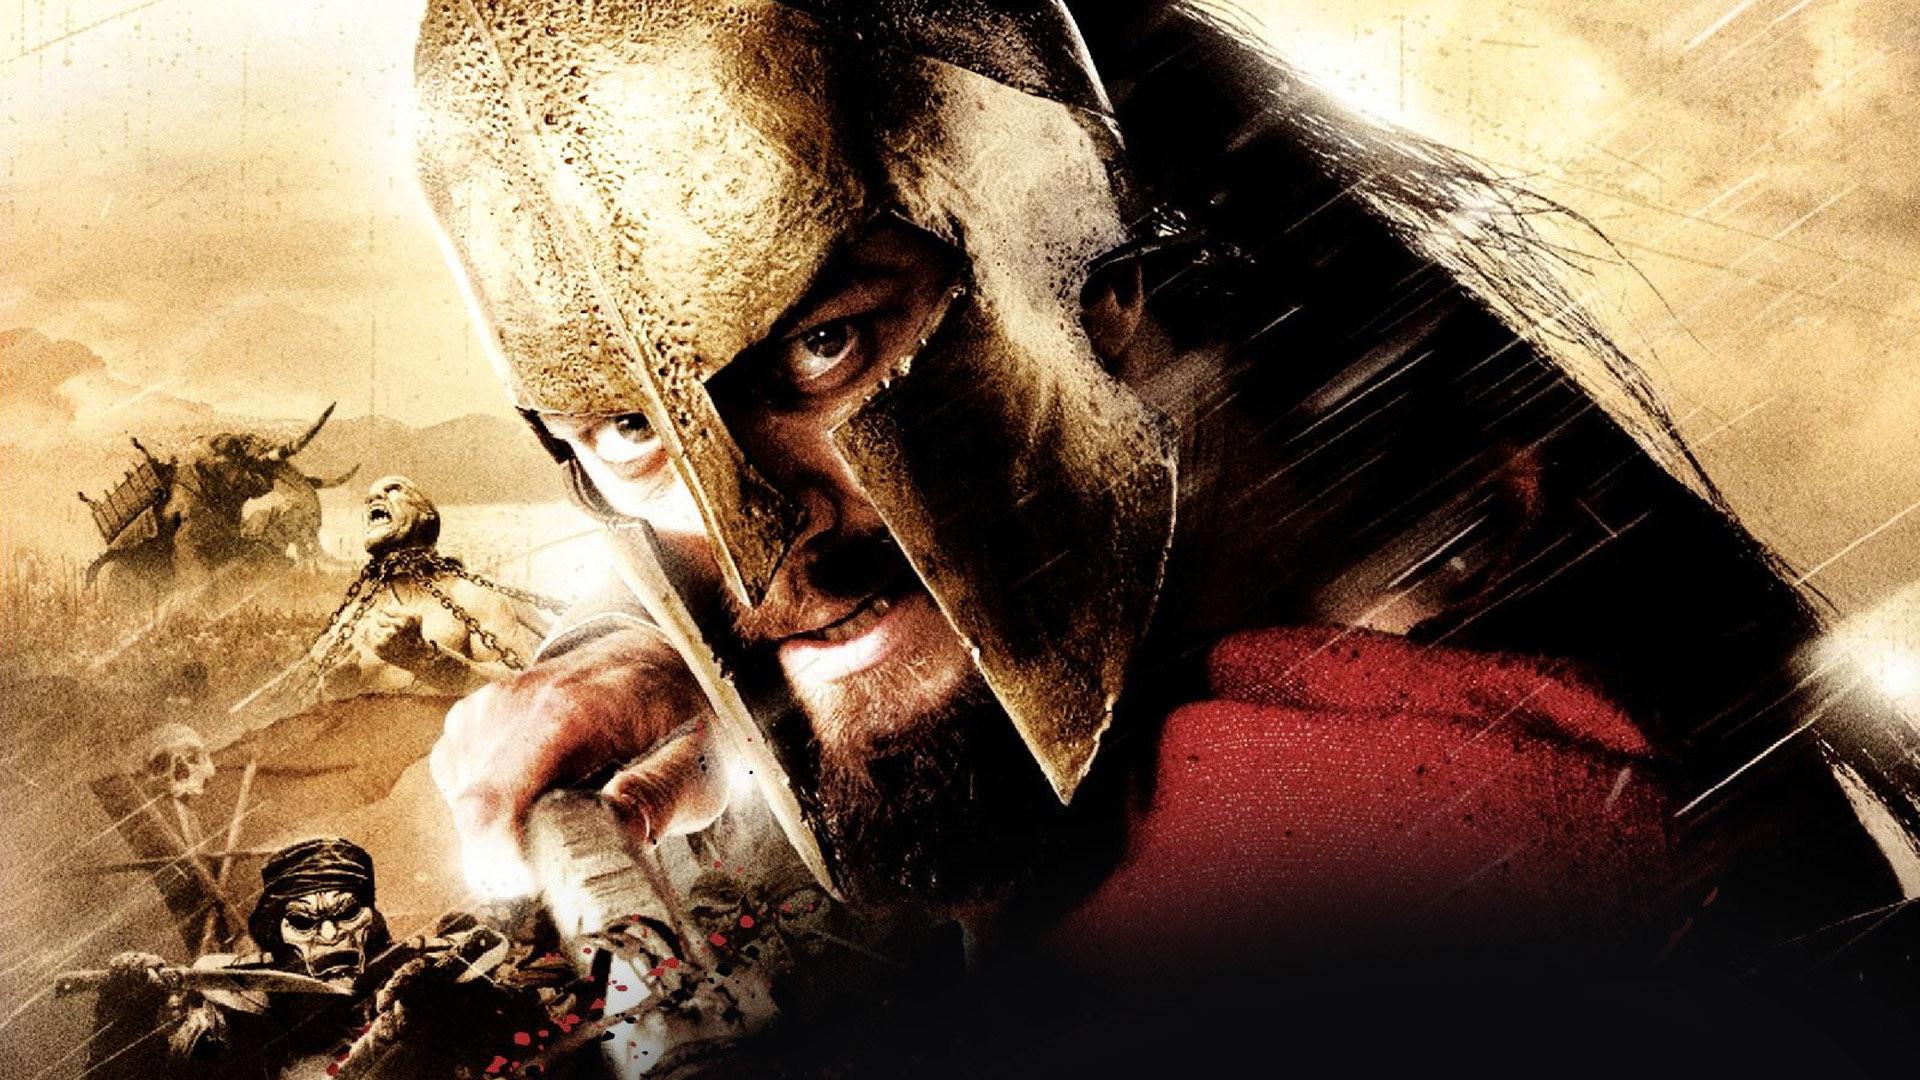 300 spartans movie 2006